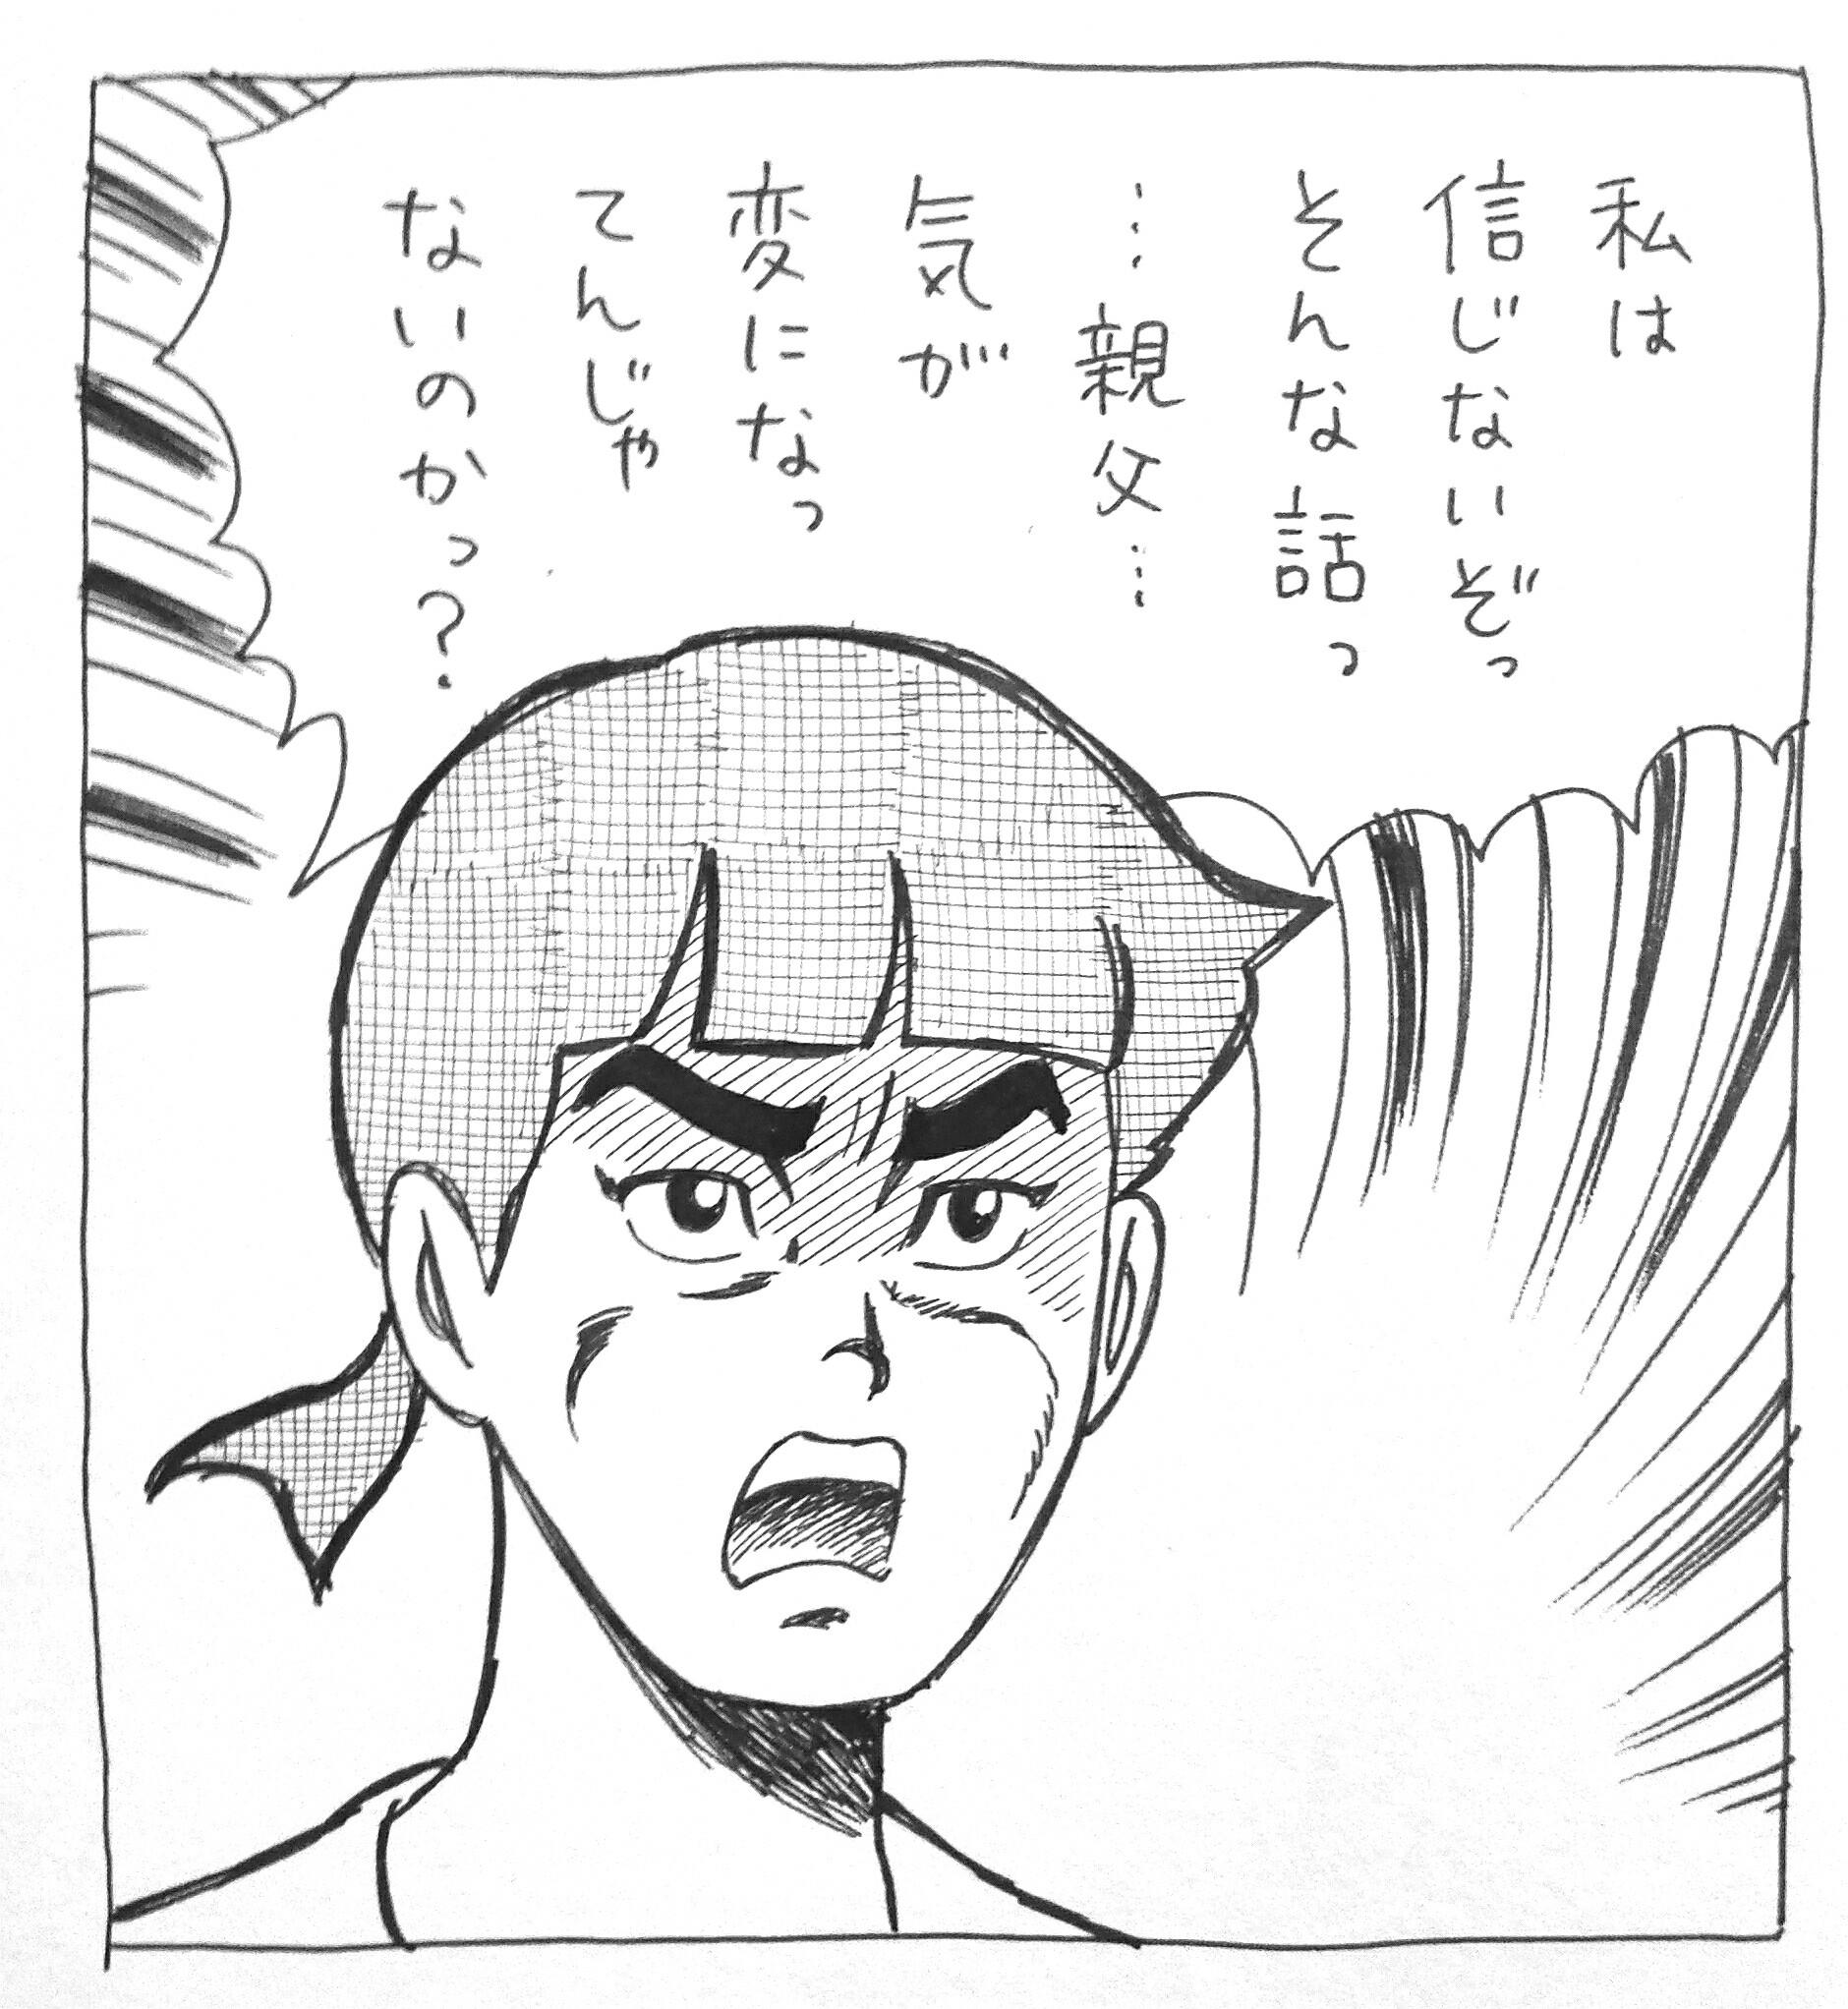 f:id:Shoko_drawing:20190812220547j:plain